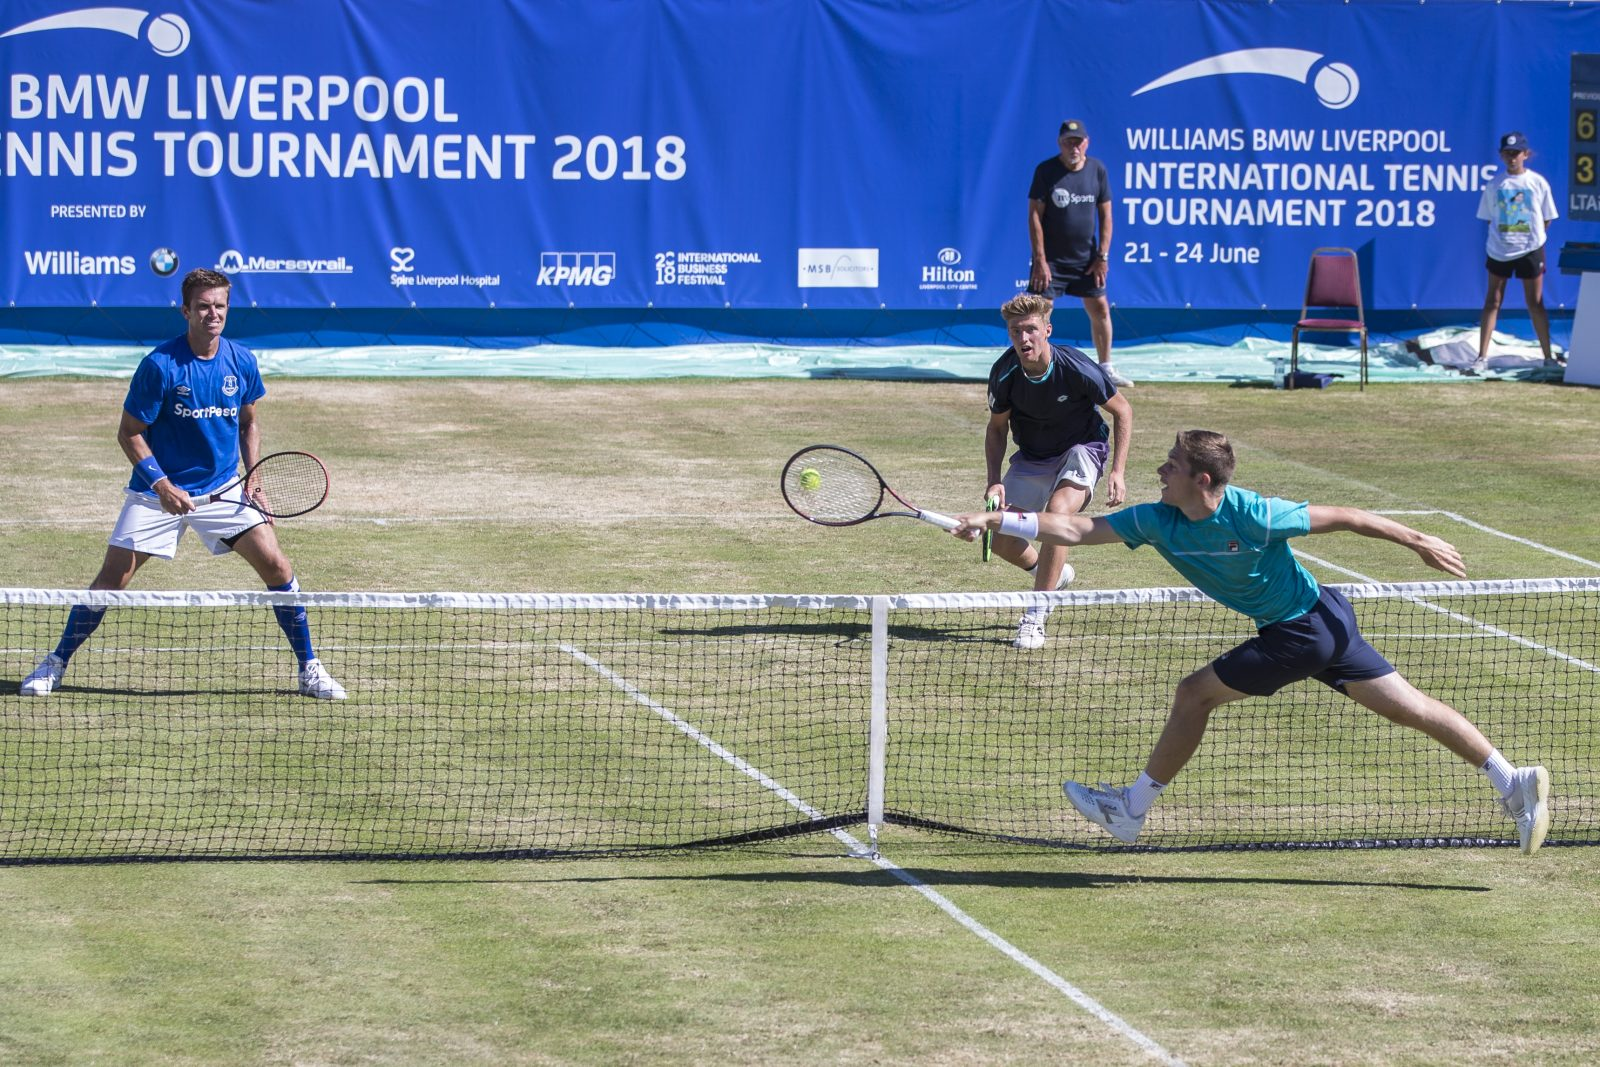 P180624-030-Liverpool_Tennis_D4-1600×1067